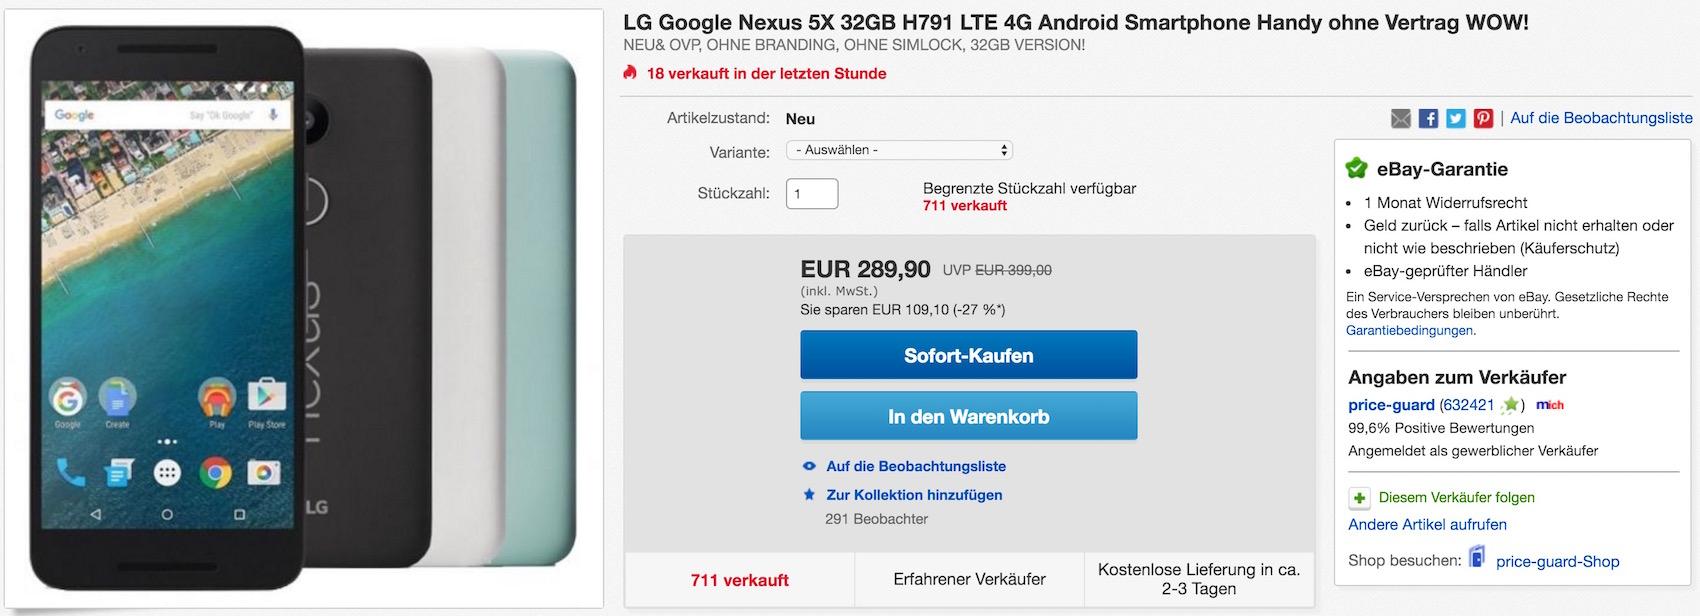 LG Google Nexus 5X bei eBay im Angebot